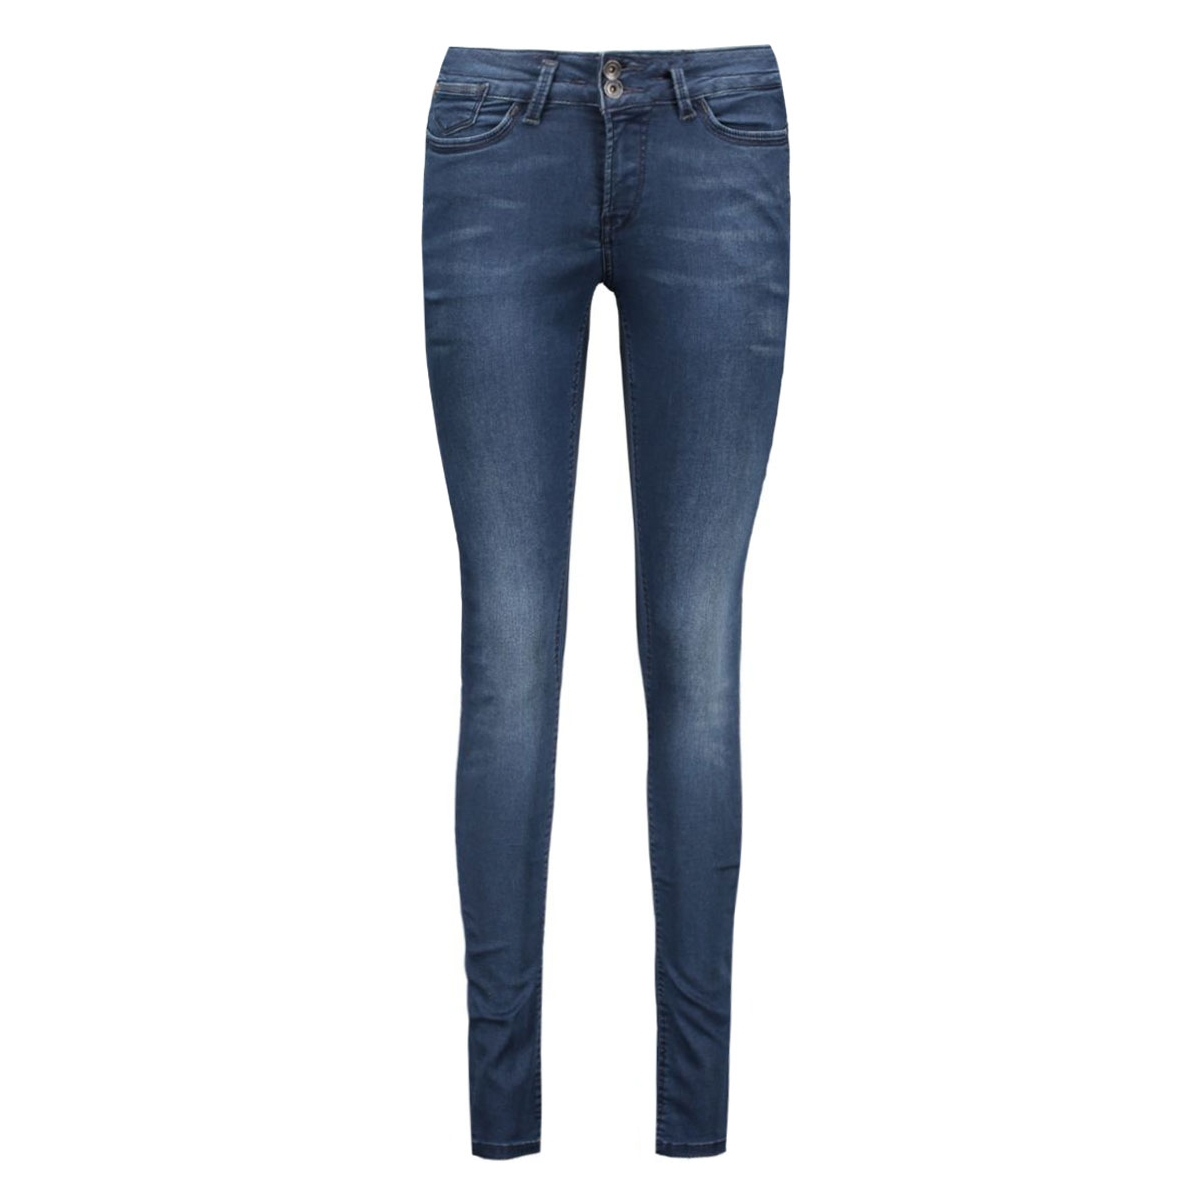 279/32 rachelle garcia jeans 2445 blue black used